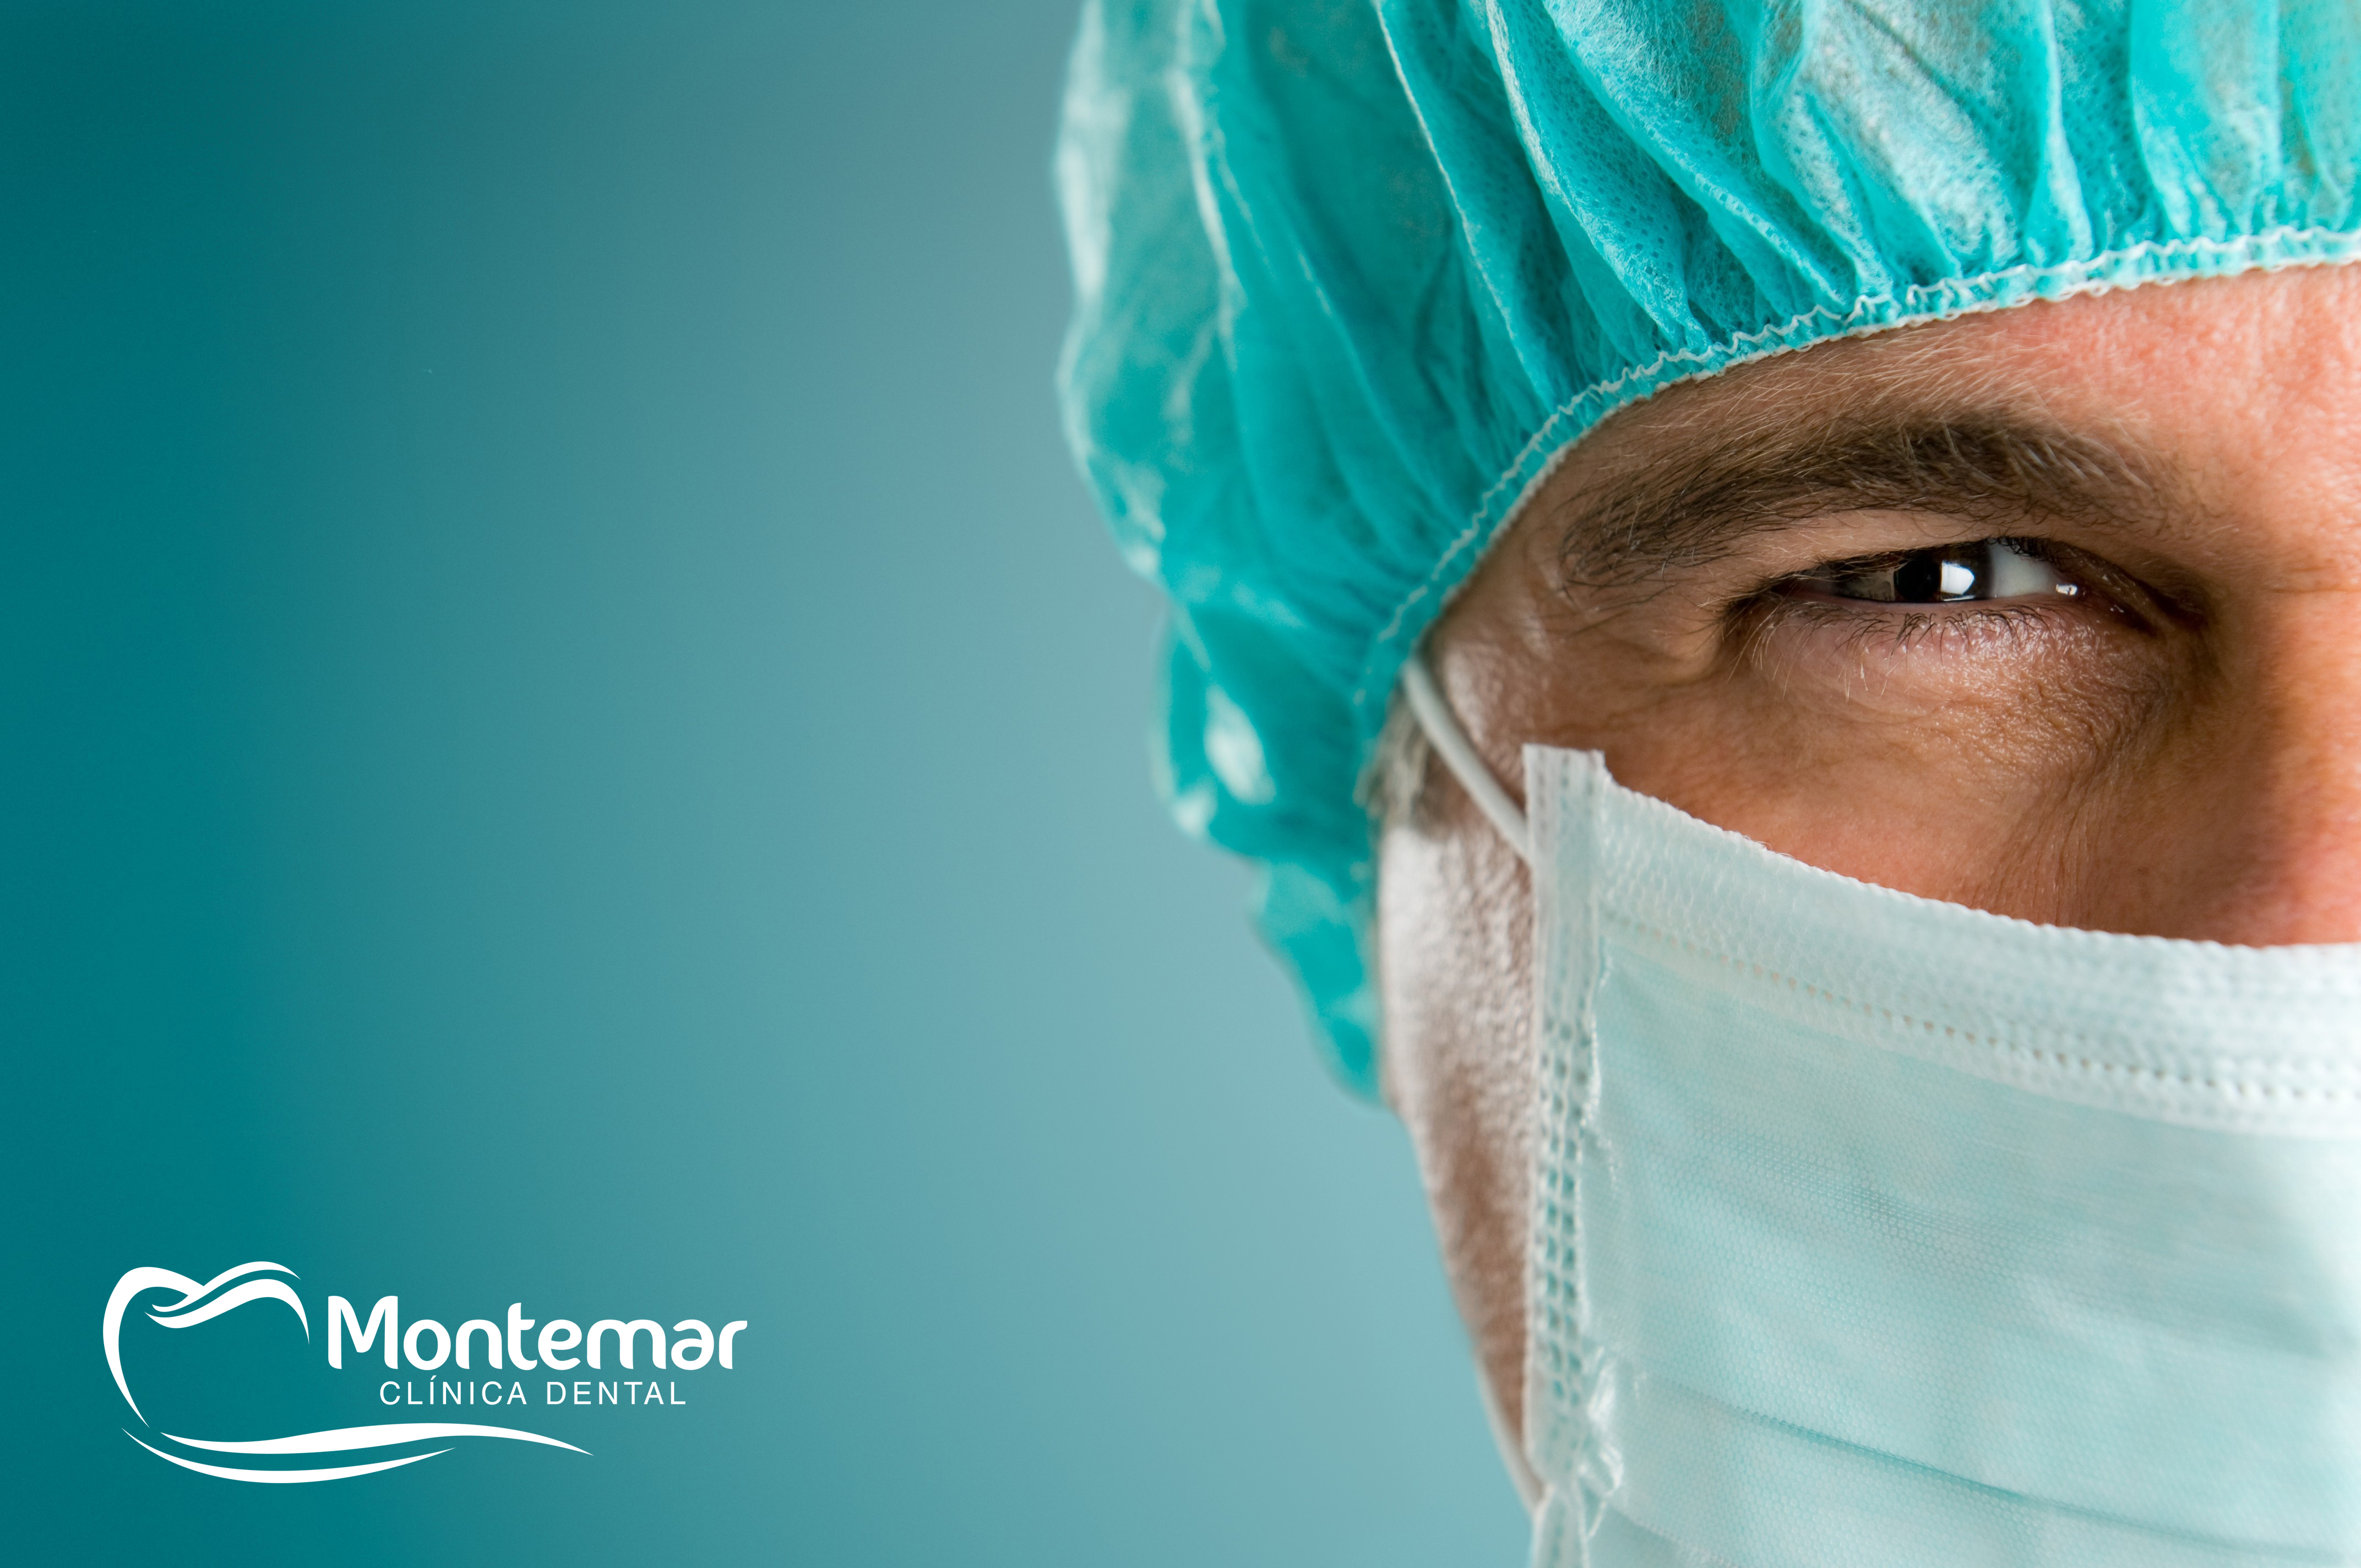 Bienvenidos a Clínica Dental Montemar